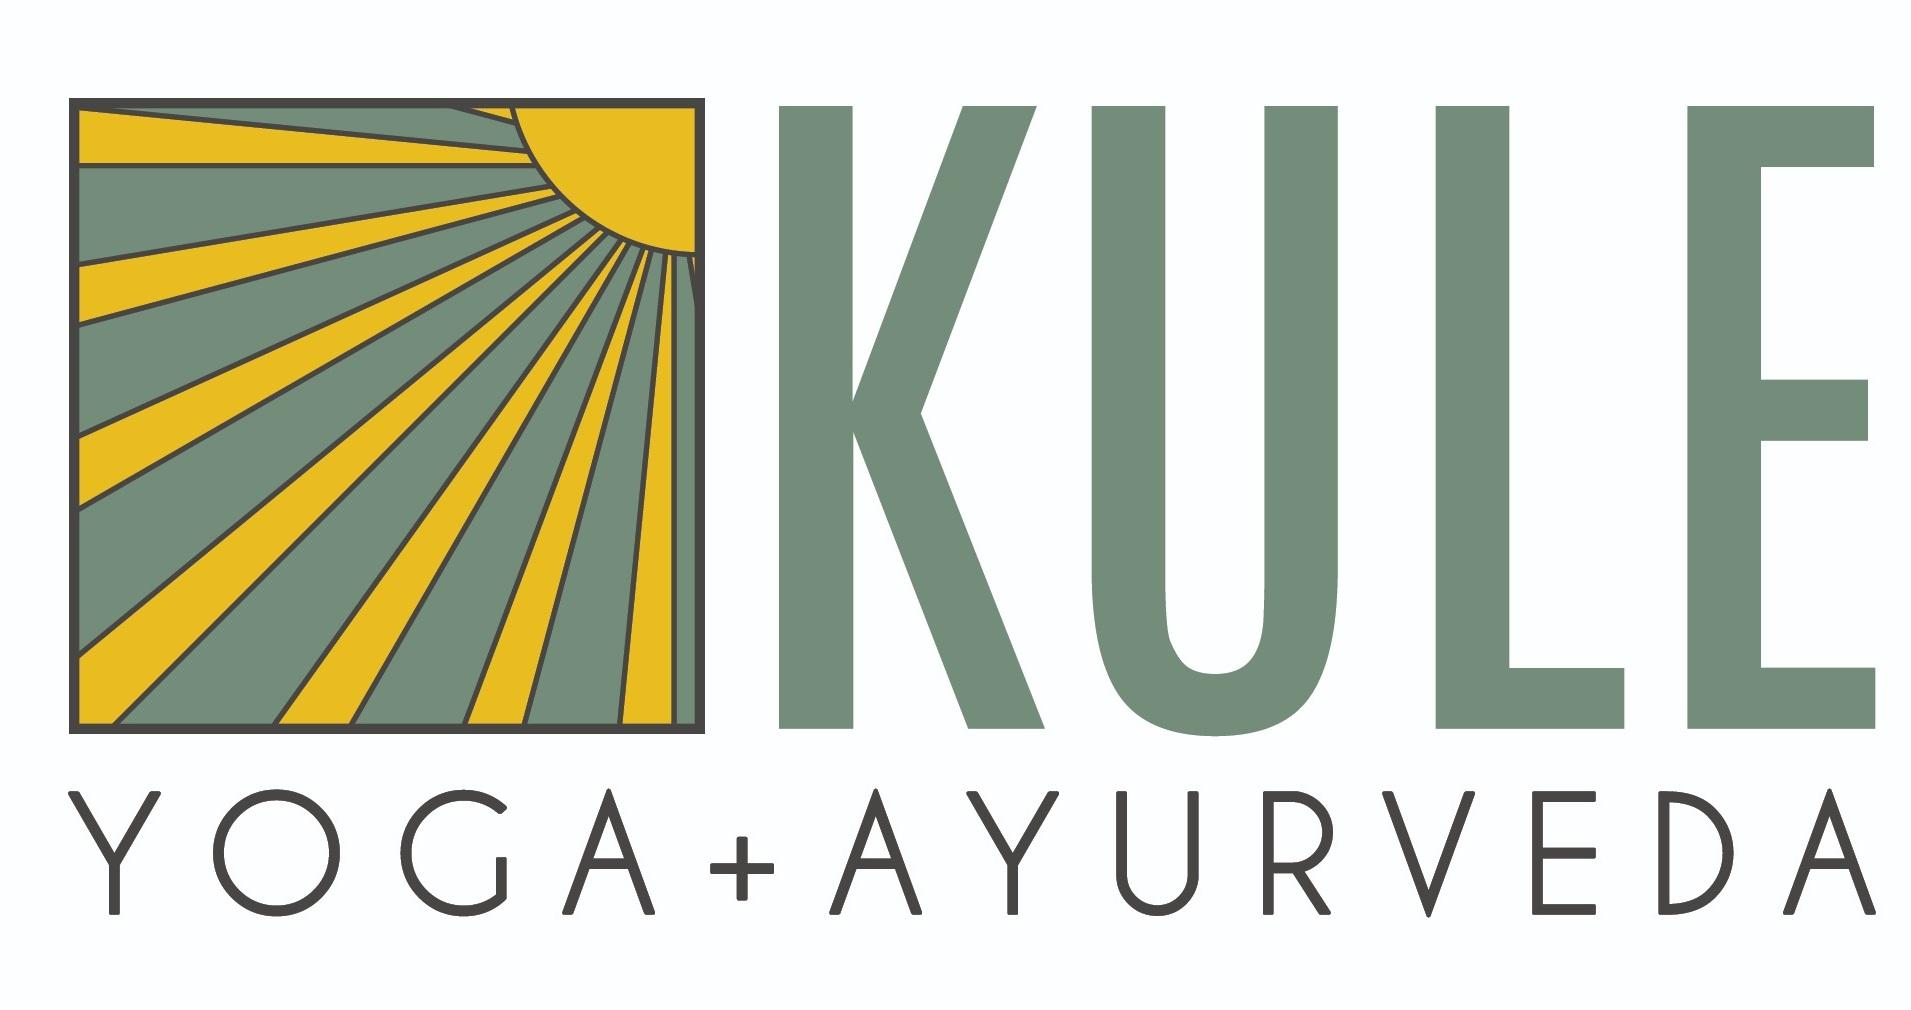 Weekly Classes have moved to KULE Yoga & Ayurveda - www.kuleyoga.com